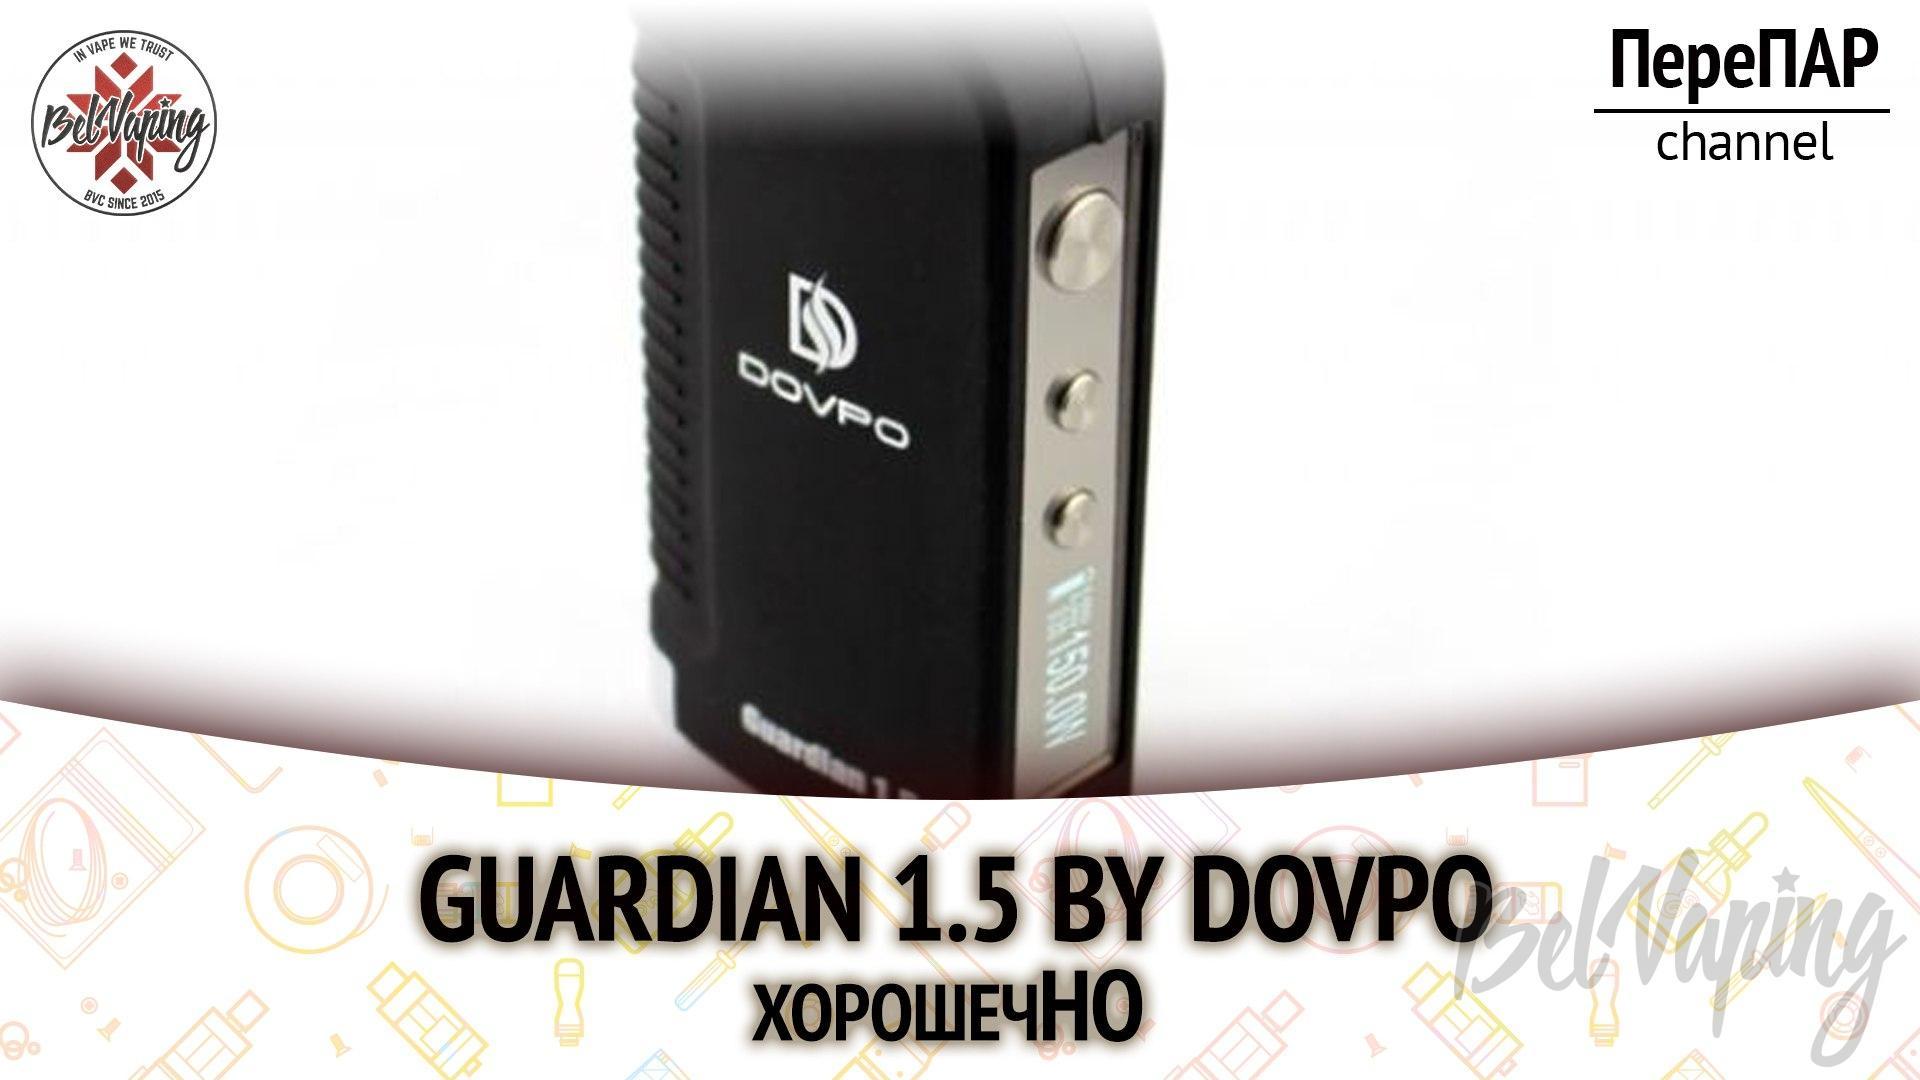 Обзор боксмода Guardian 1.5 от Dovpo